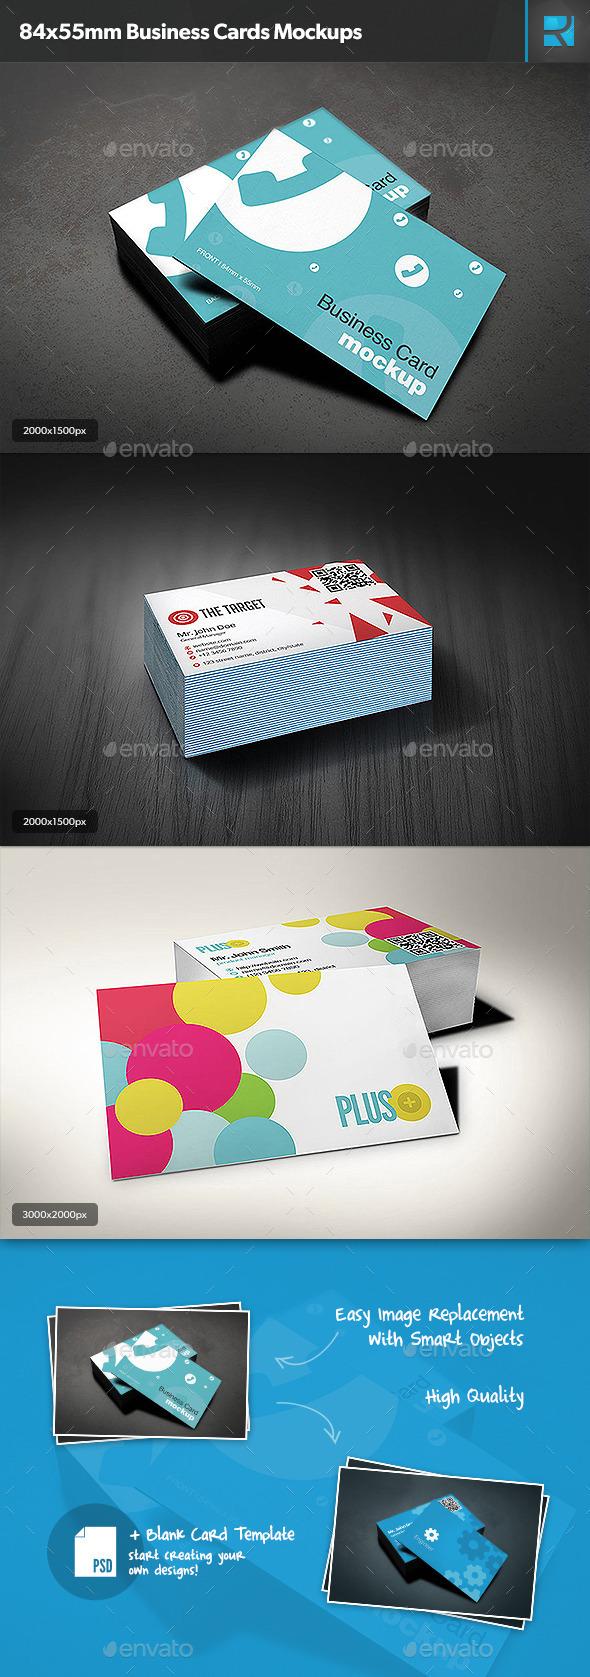 84x55mm Business Cards Mockups